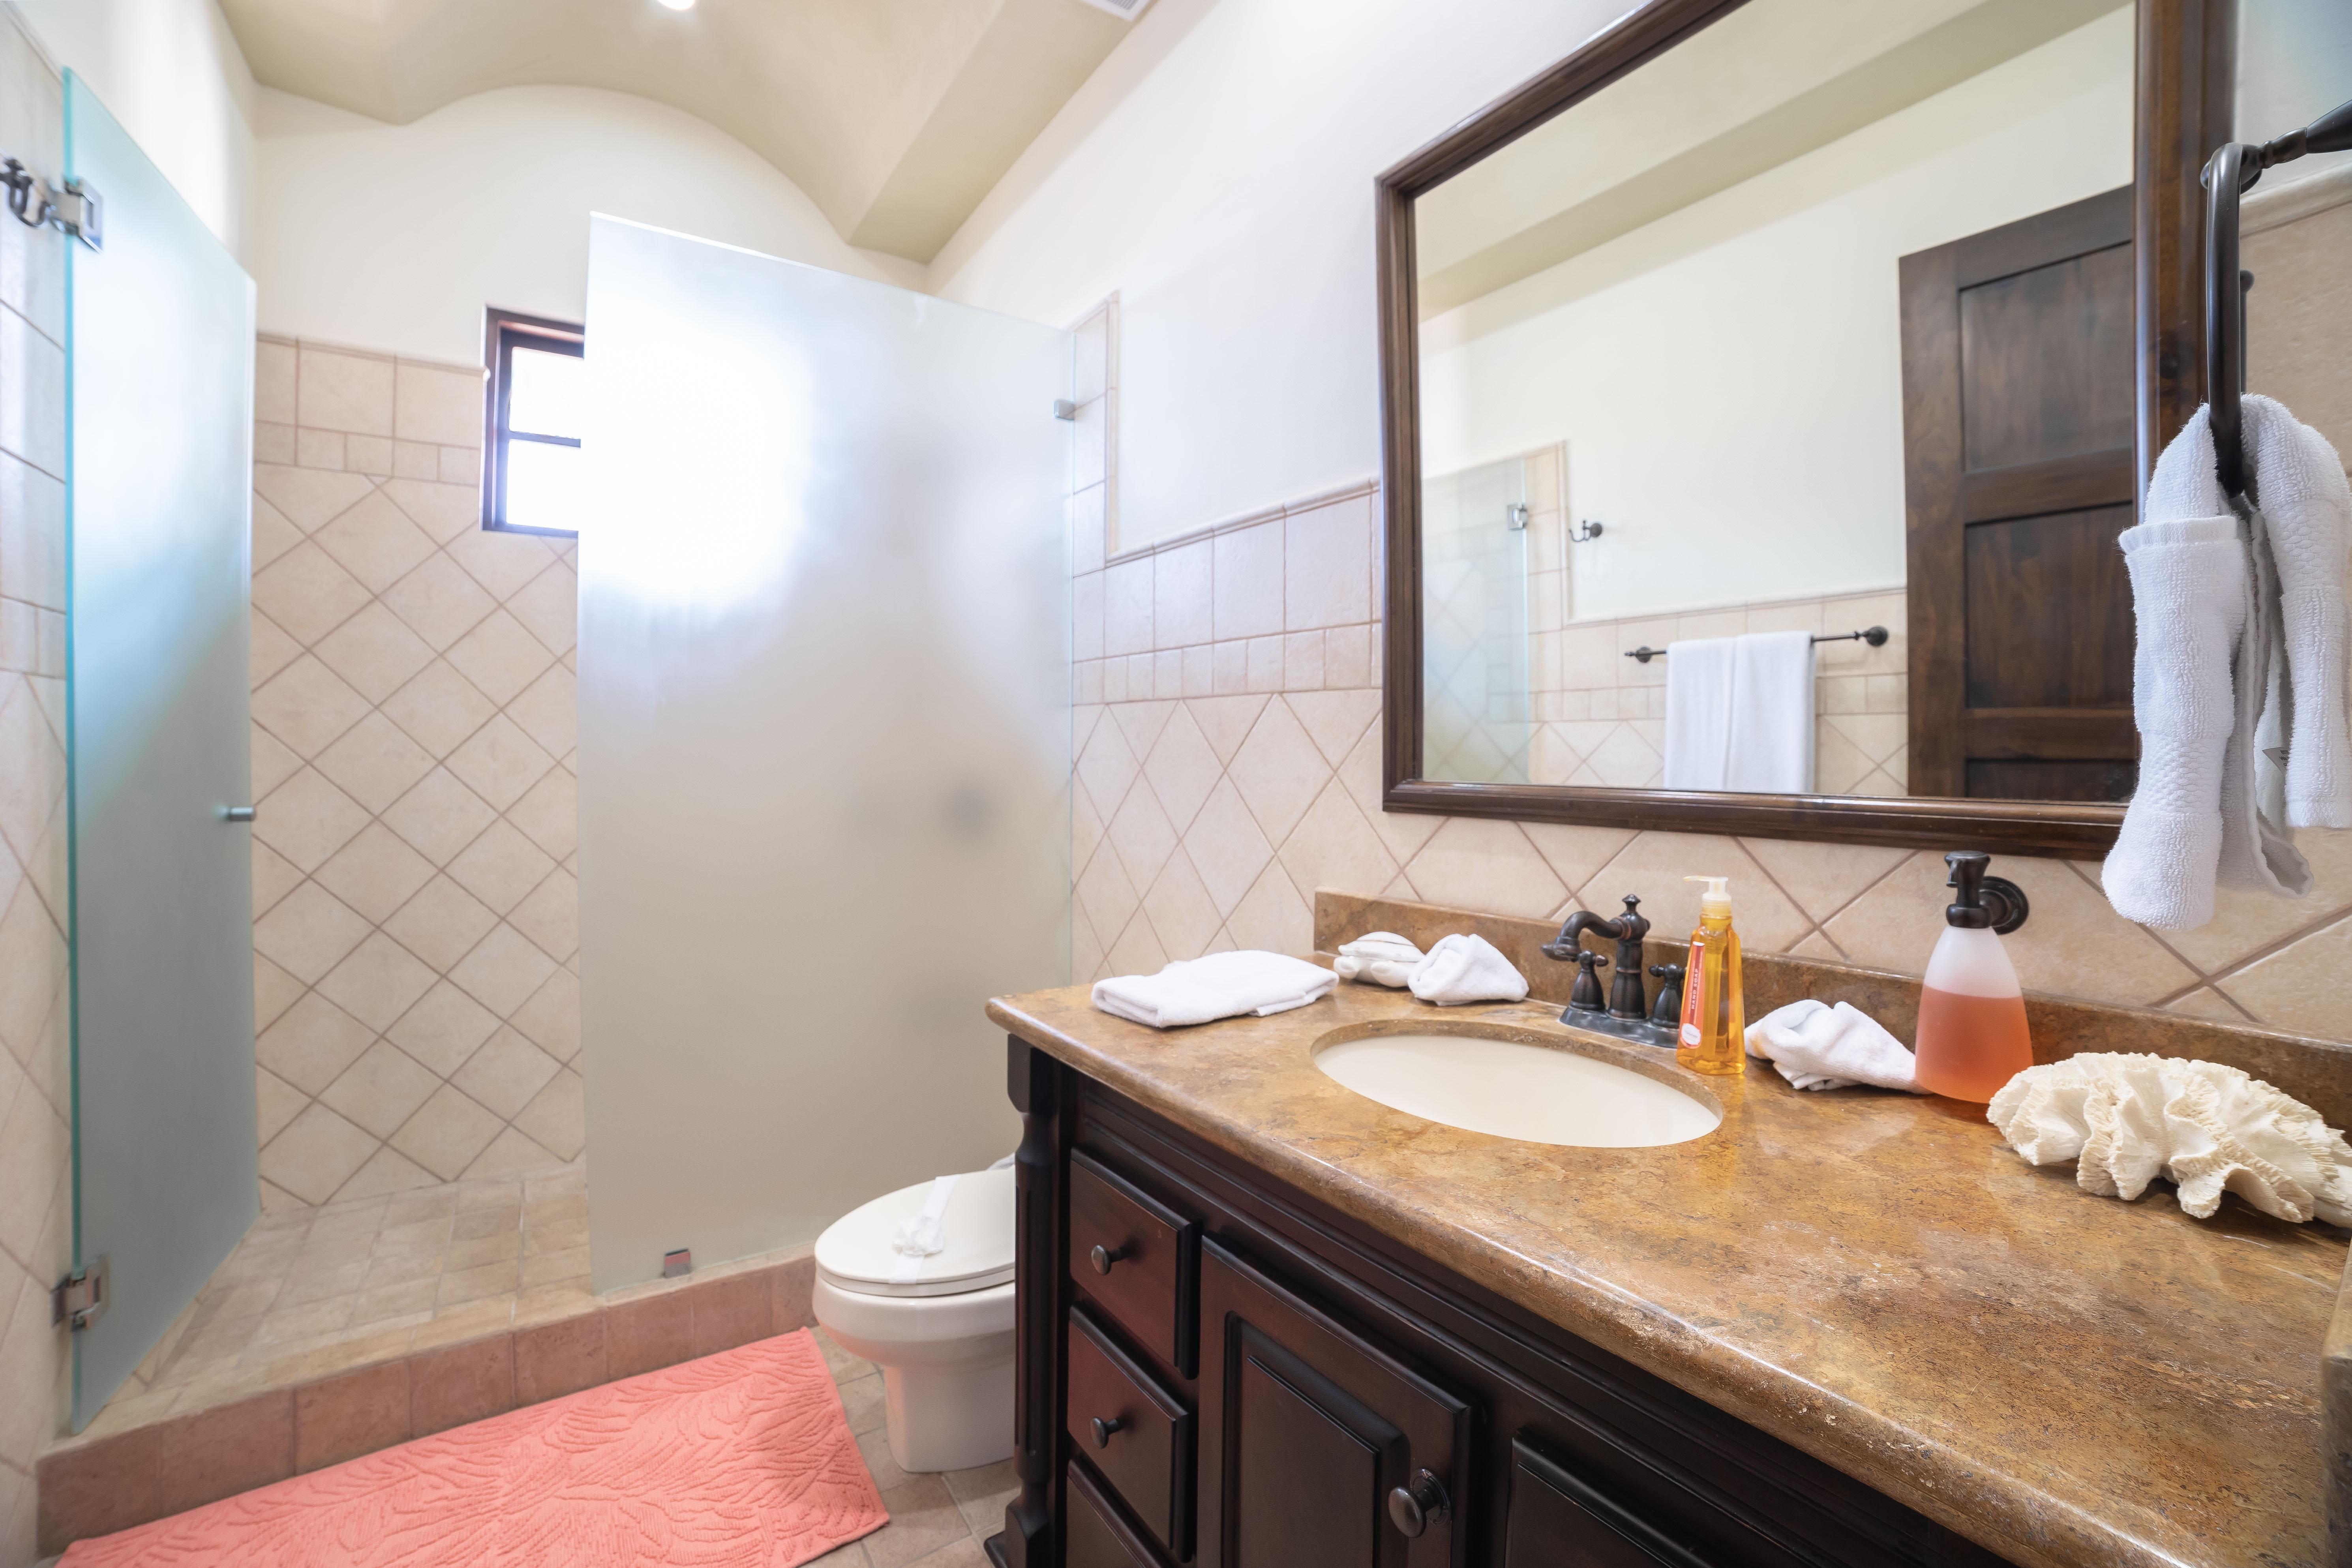 Gorgeous full bathroom